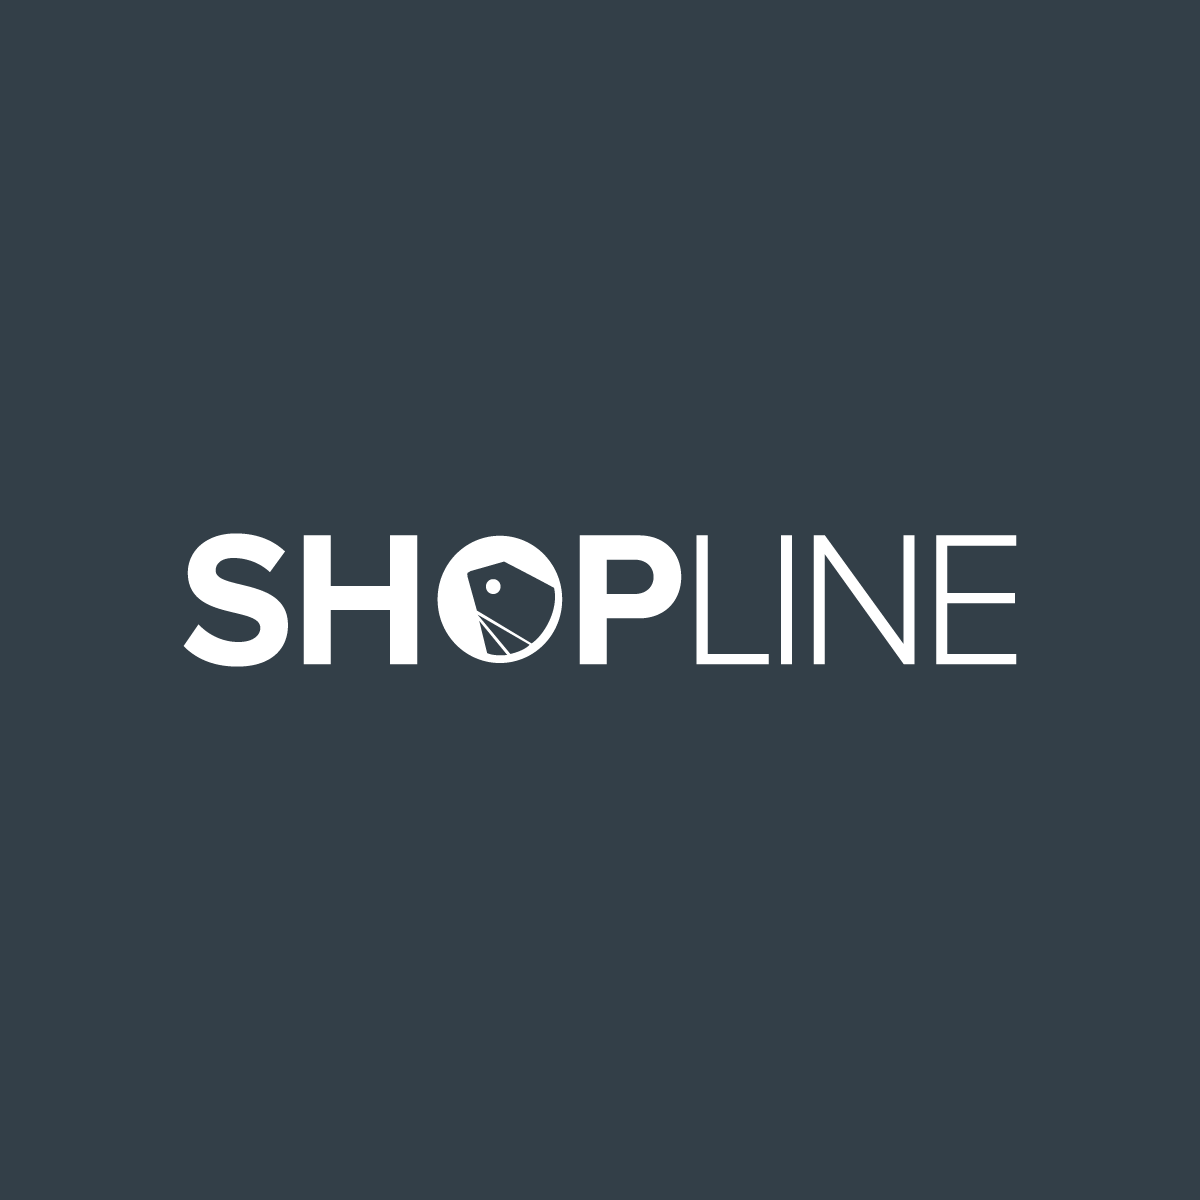 SHOPLINE 行銷團隊